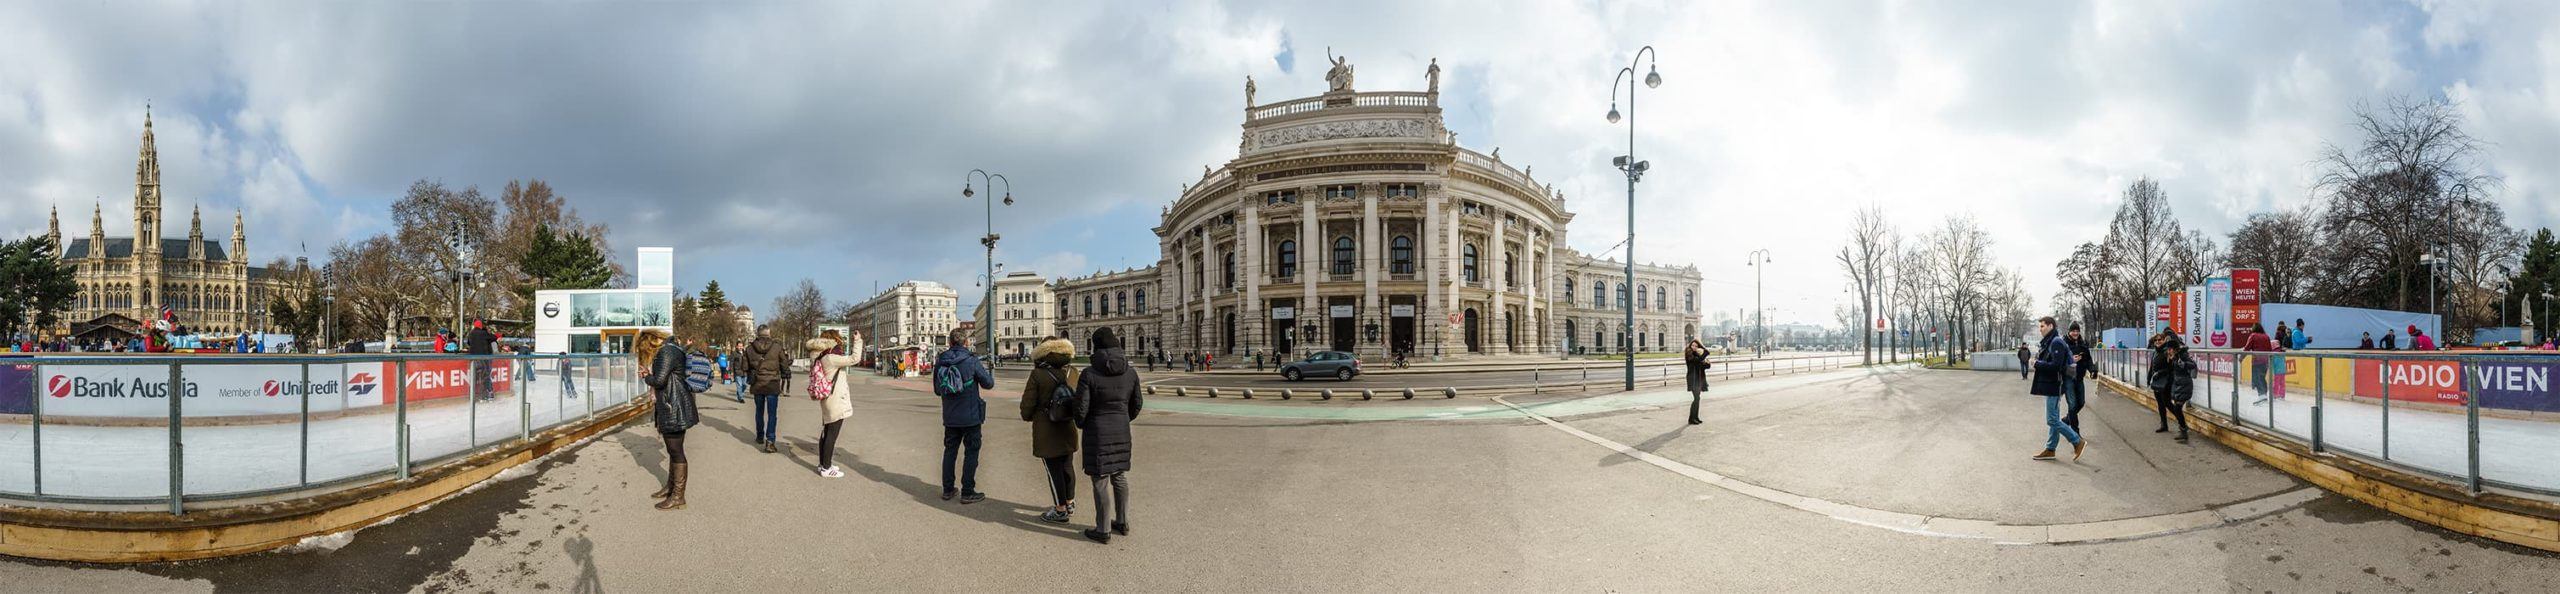 wien-panorama-burgtheater